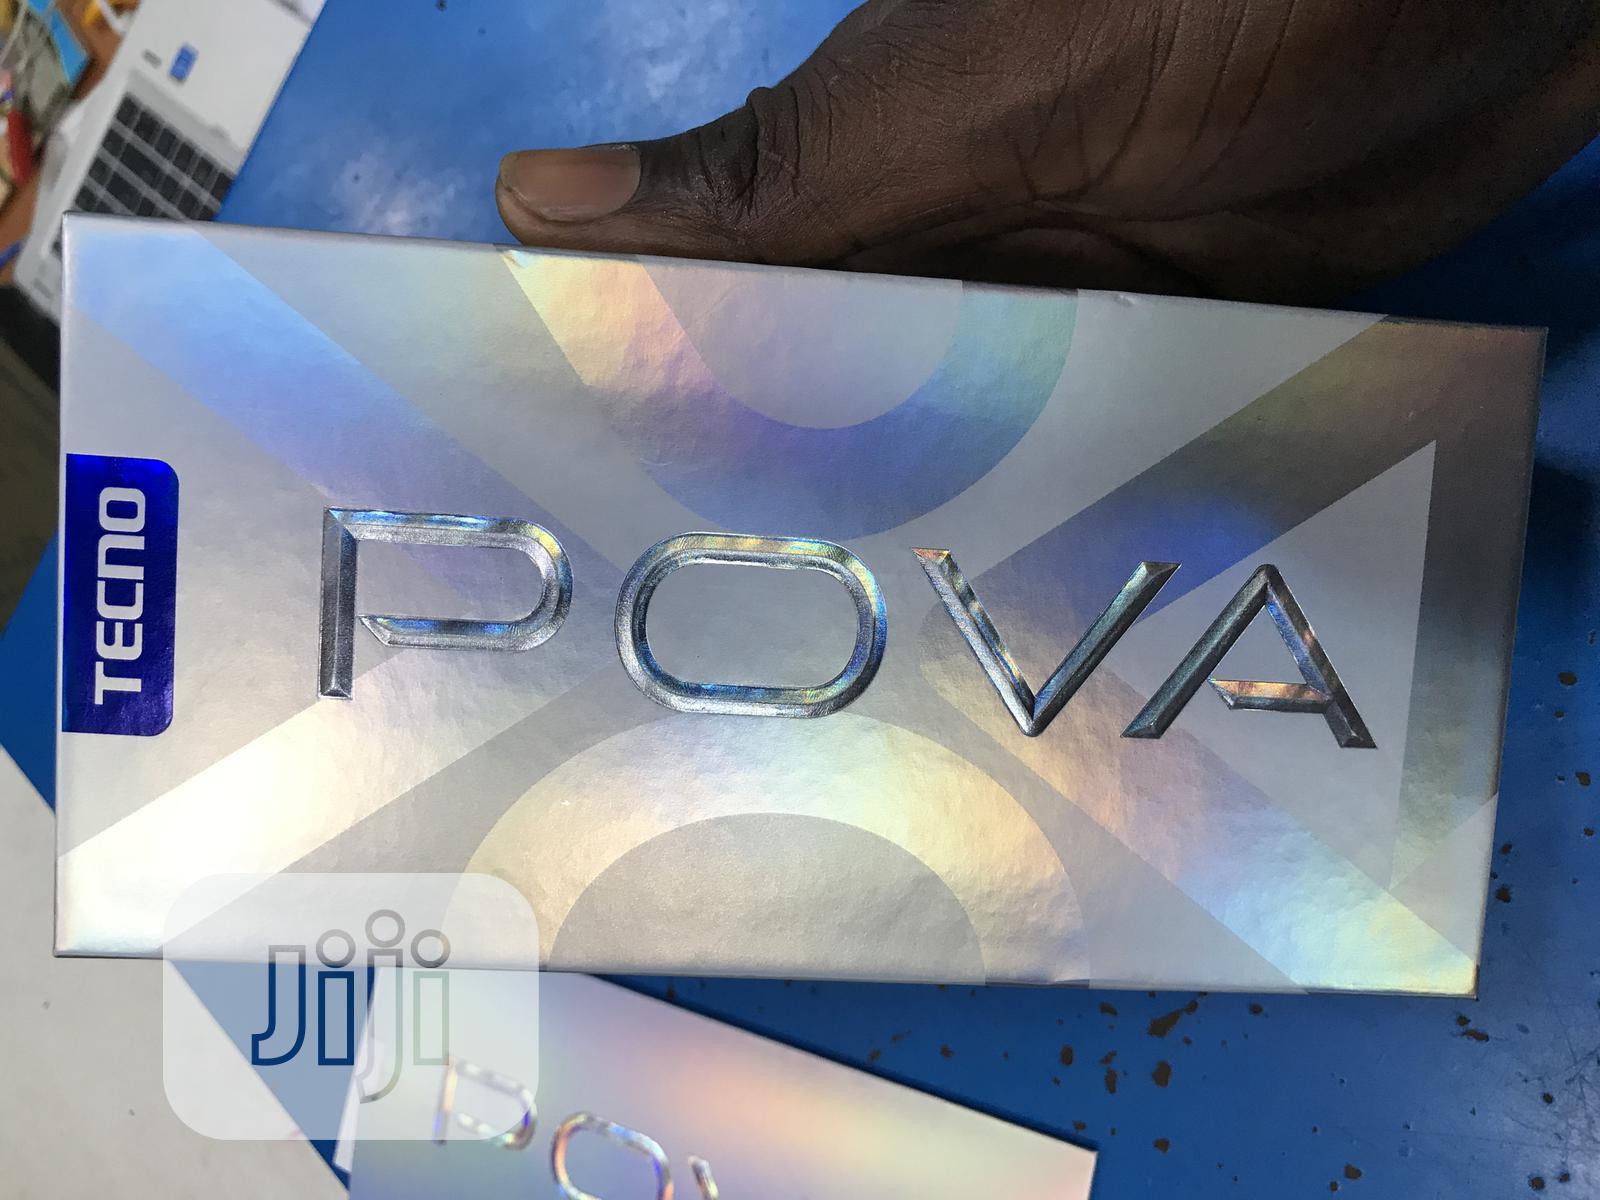 New Tecno Pova 128 GB Blue   Mobile Phones for sale in Ikeja, Lagos State, Nigeria